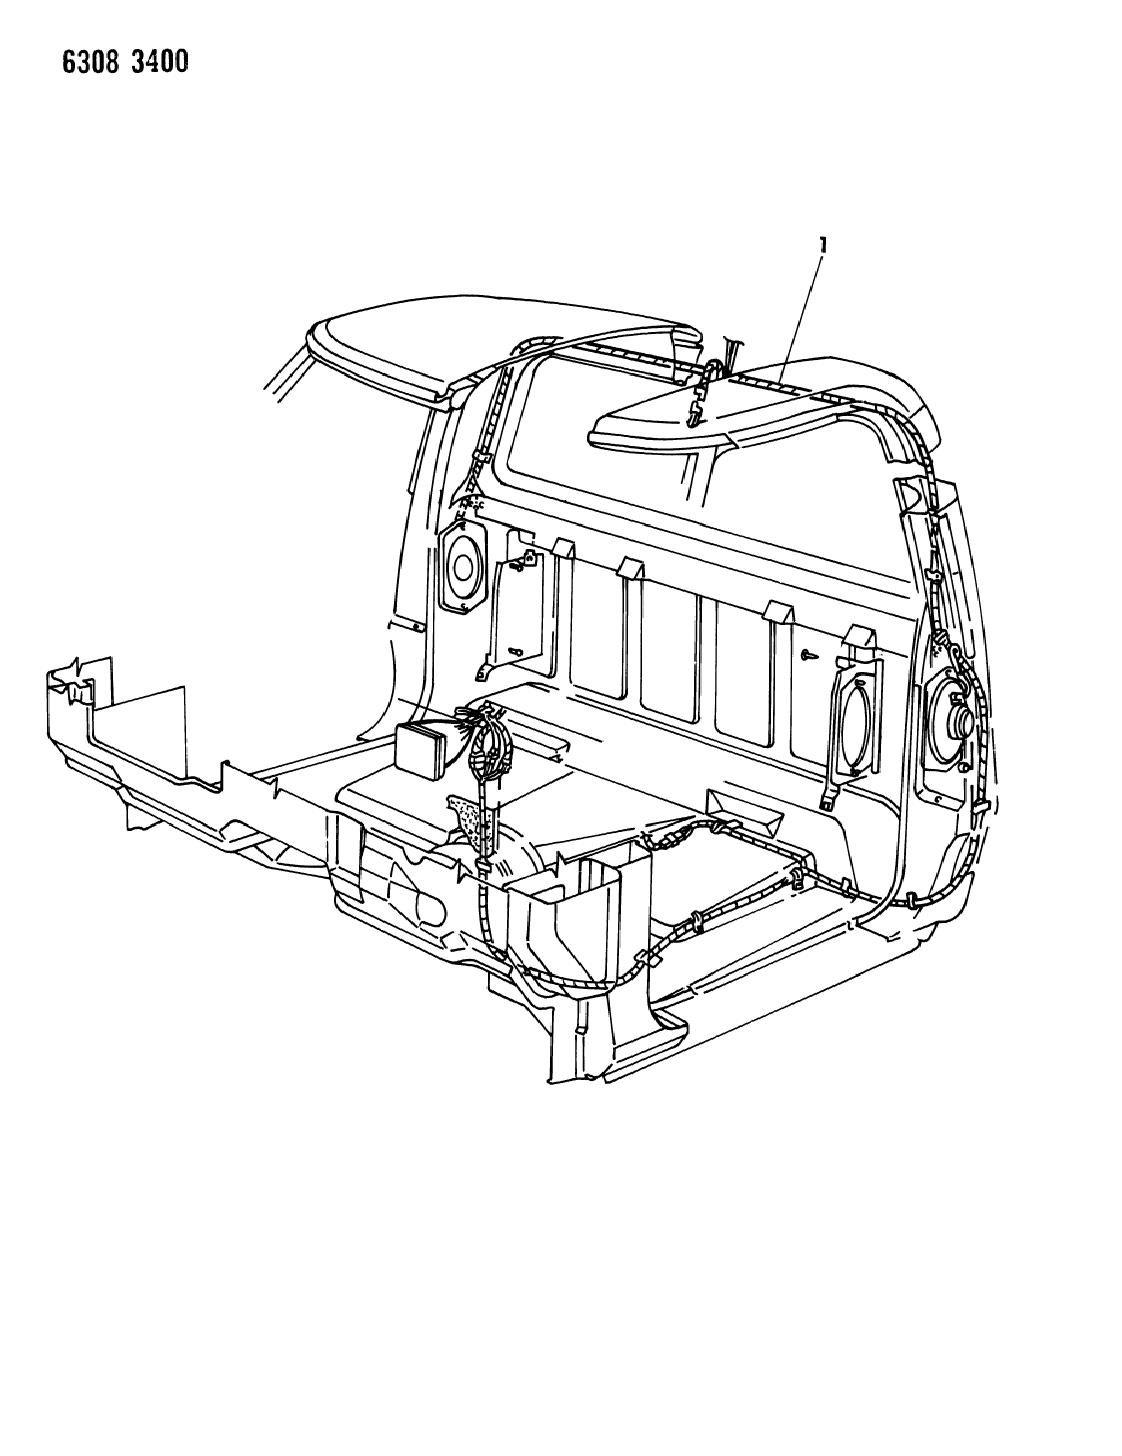 1987 Dodge D350 Wiring - Body & Accessories